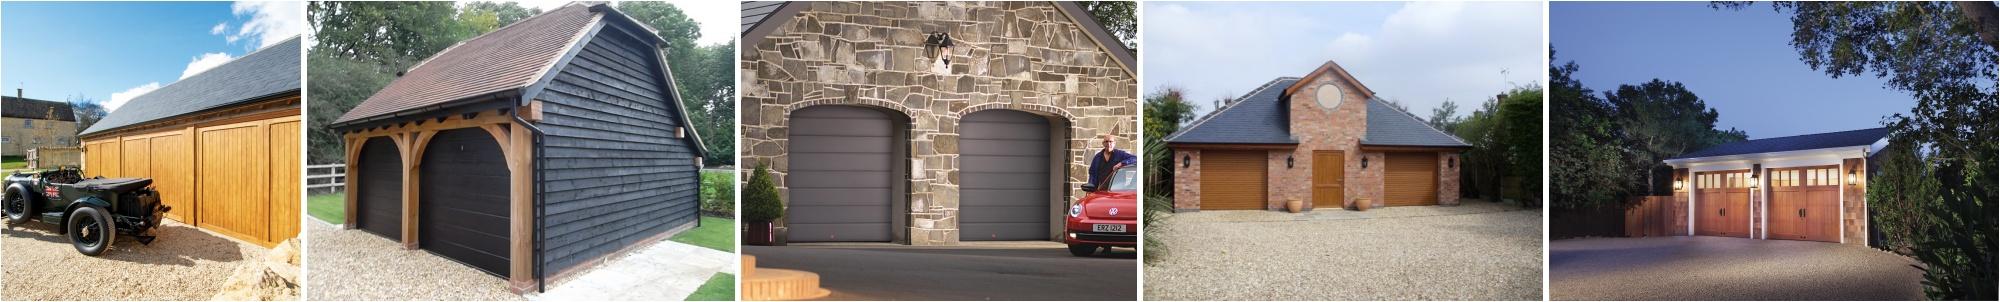 Made to measure, bespoke garage doors